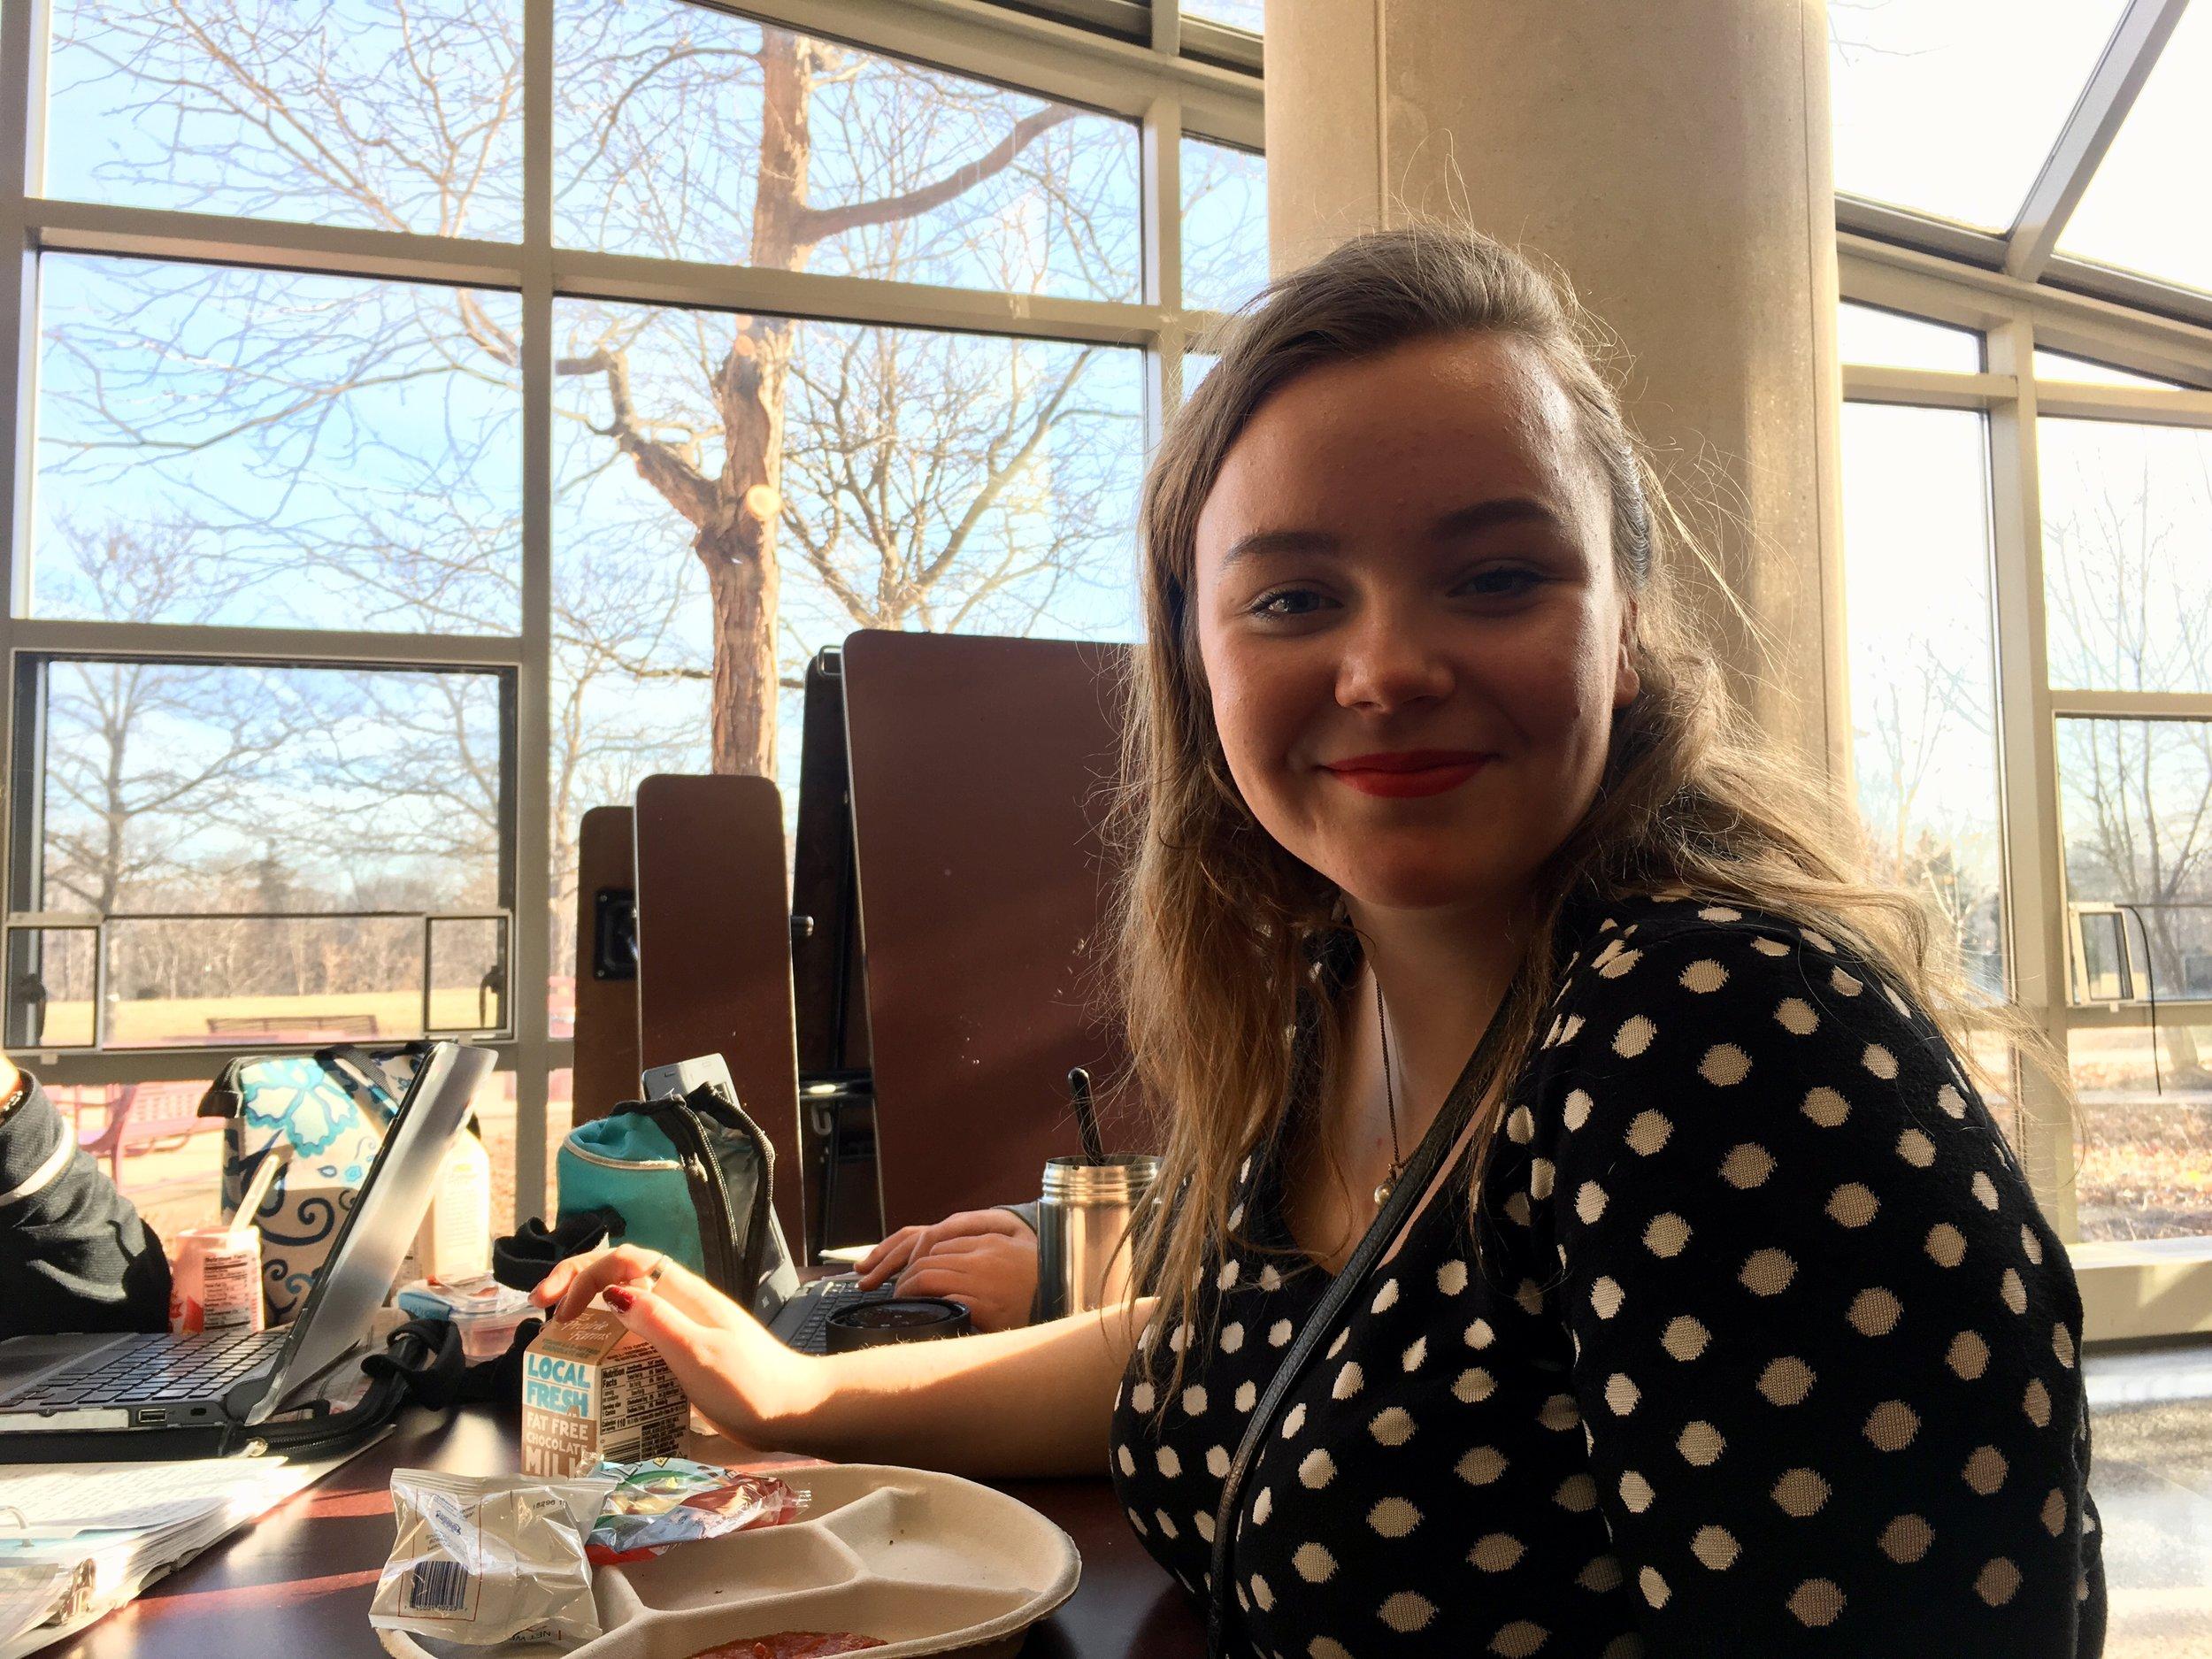 Kiera A Steckelberg, Adv. 000, just wants some alone time over break!